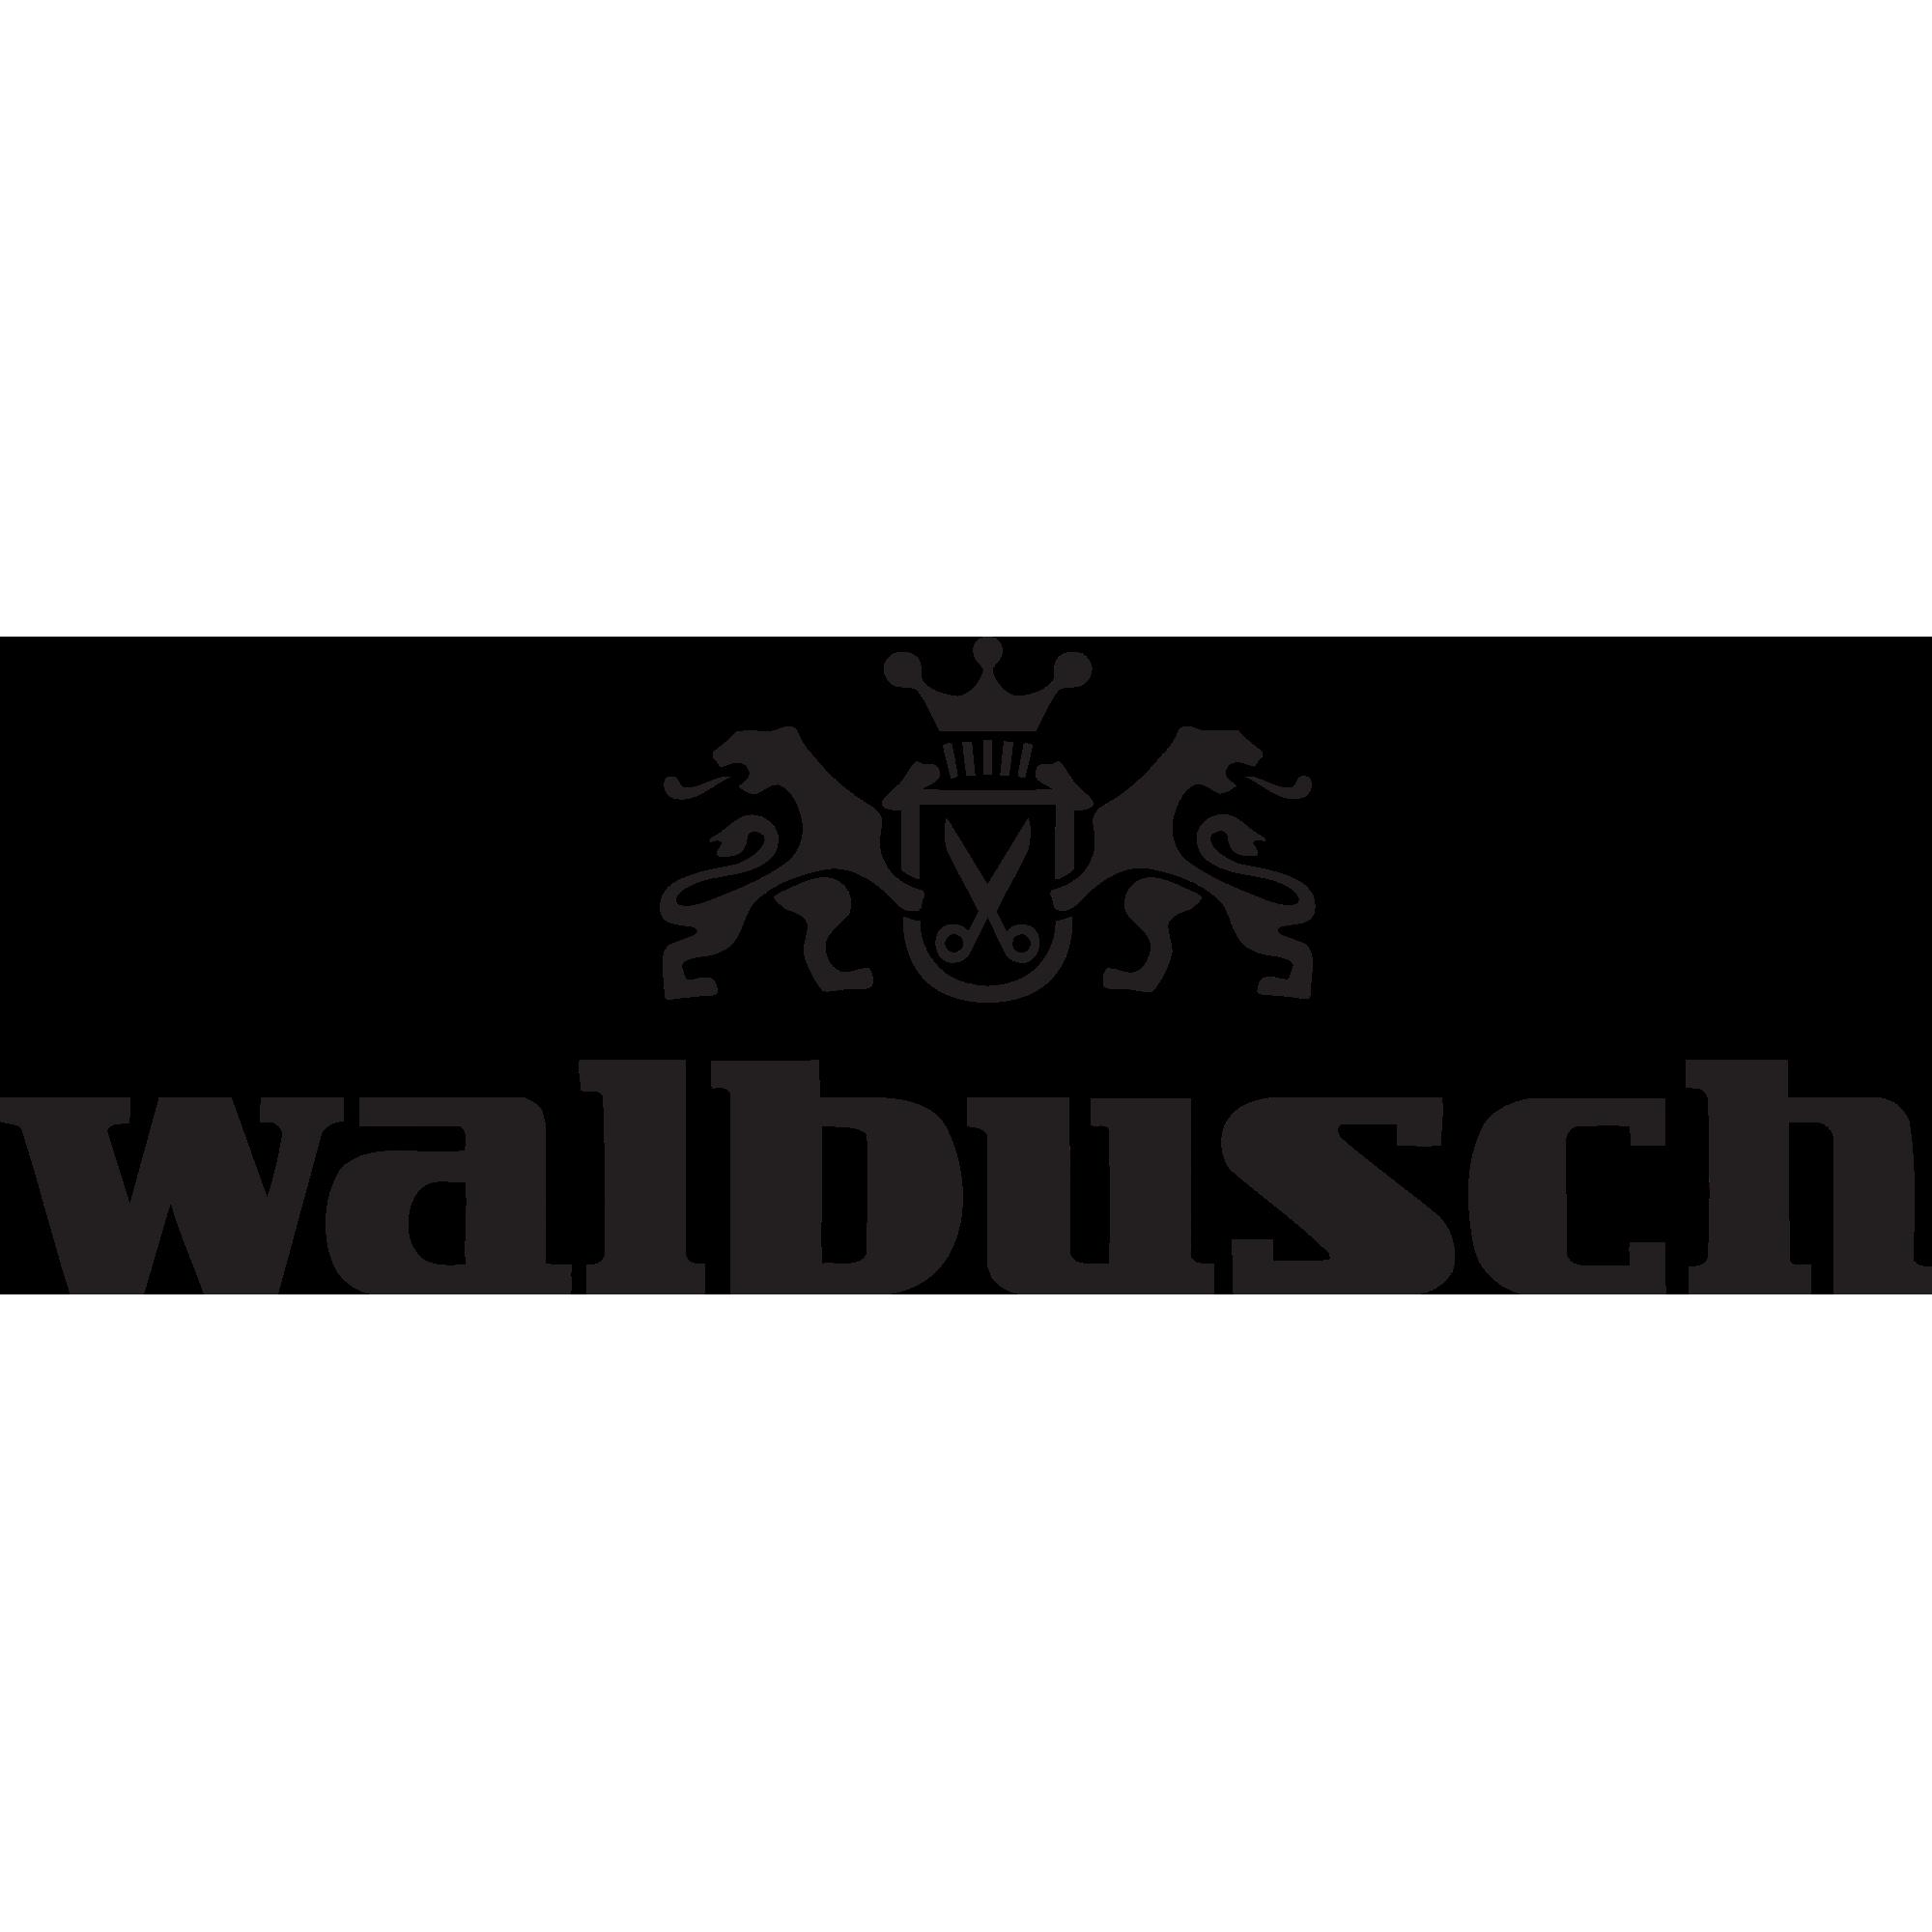 coupon code 2018 shoes no sale tax walbusch Angebot – Filialen Öffnungszeiten | Kupino.de